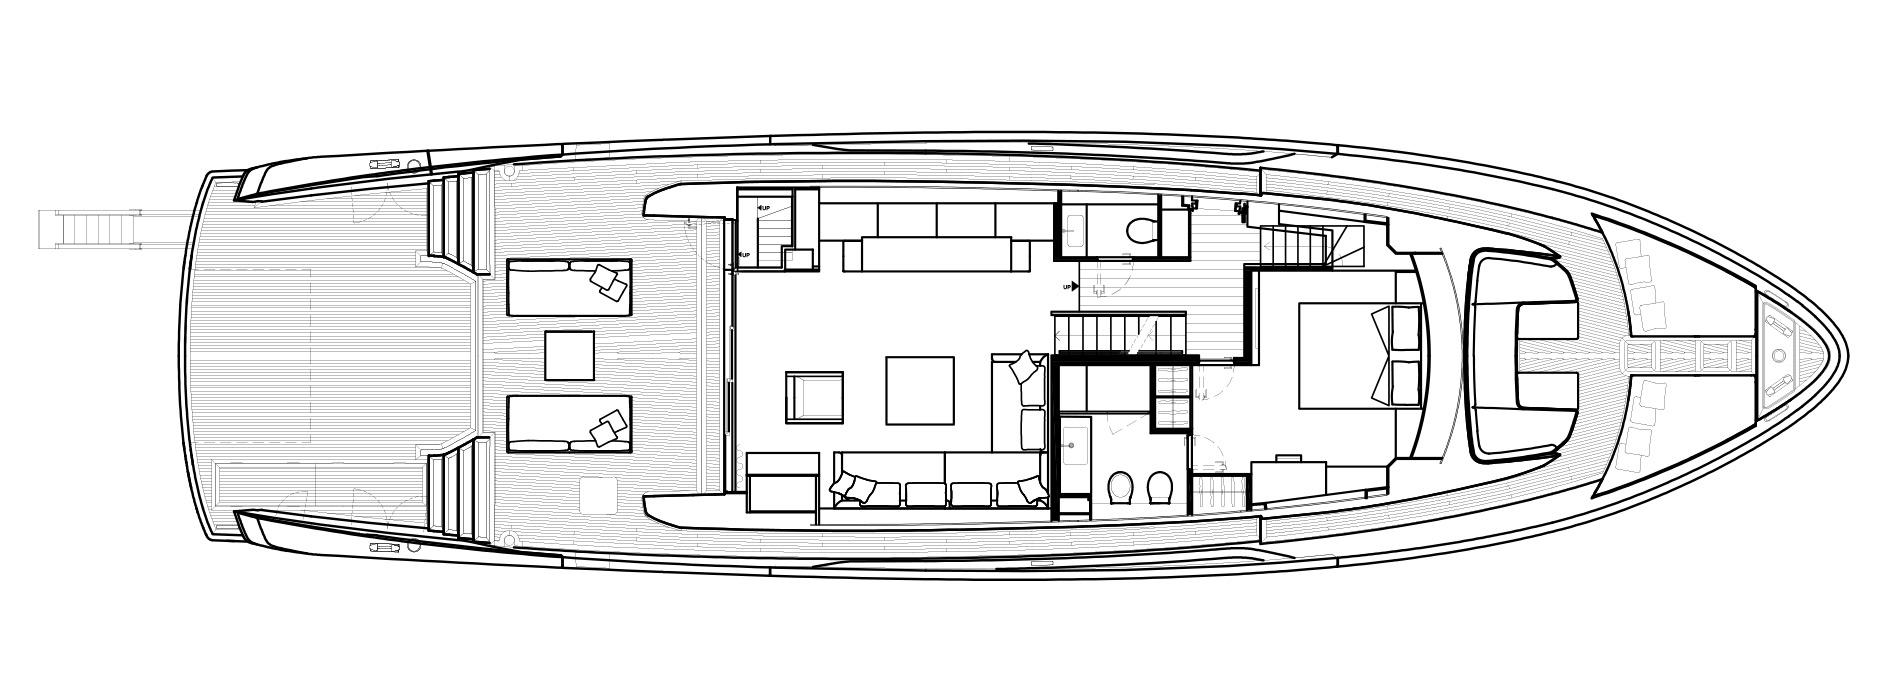 Sanlorenzo Yachts SX88 Главная палуба версия C